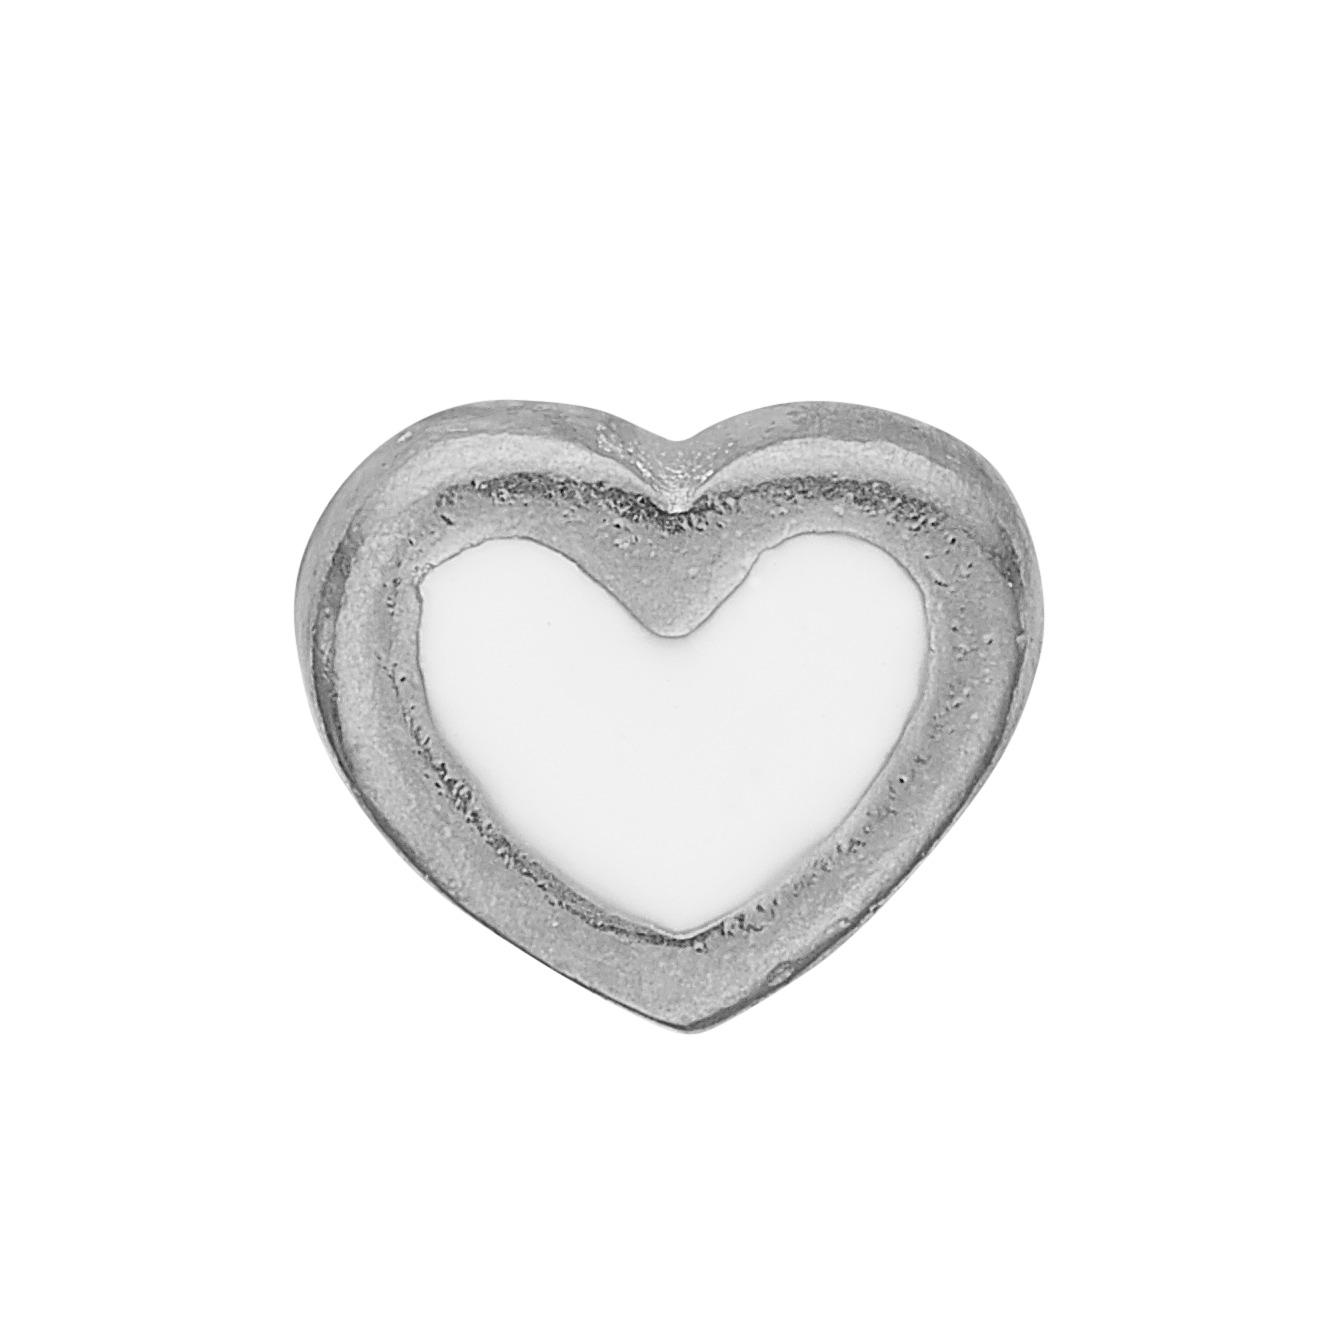 christina watches Christina collect white enamel heart - 603-s3 på brodersen + kobborg